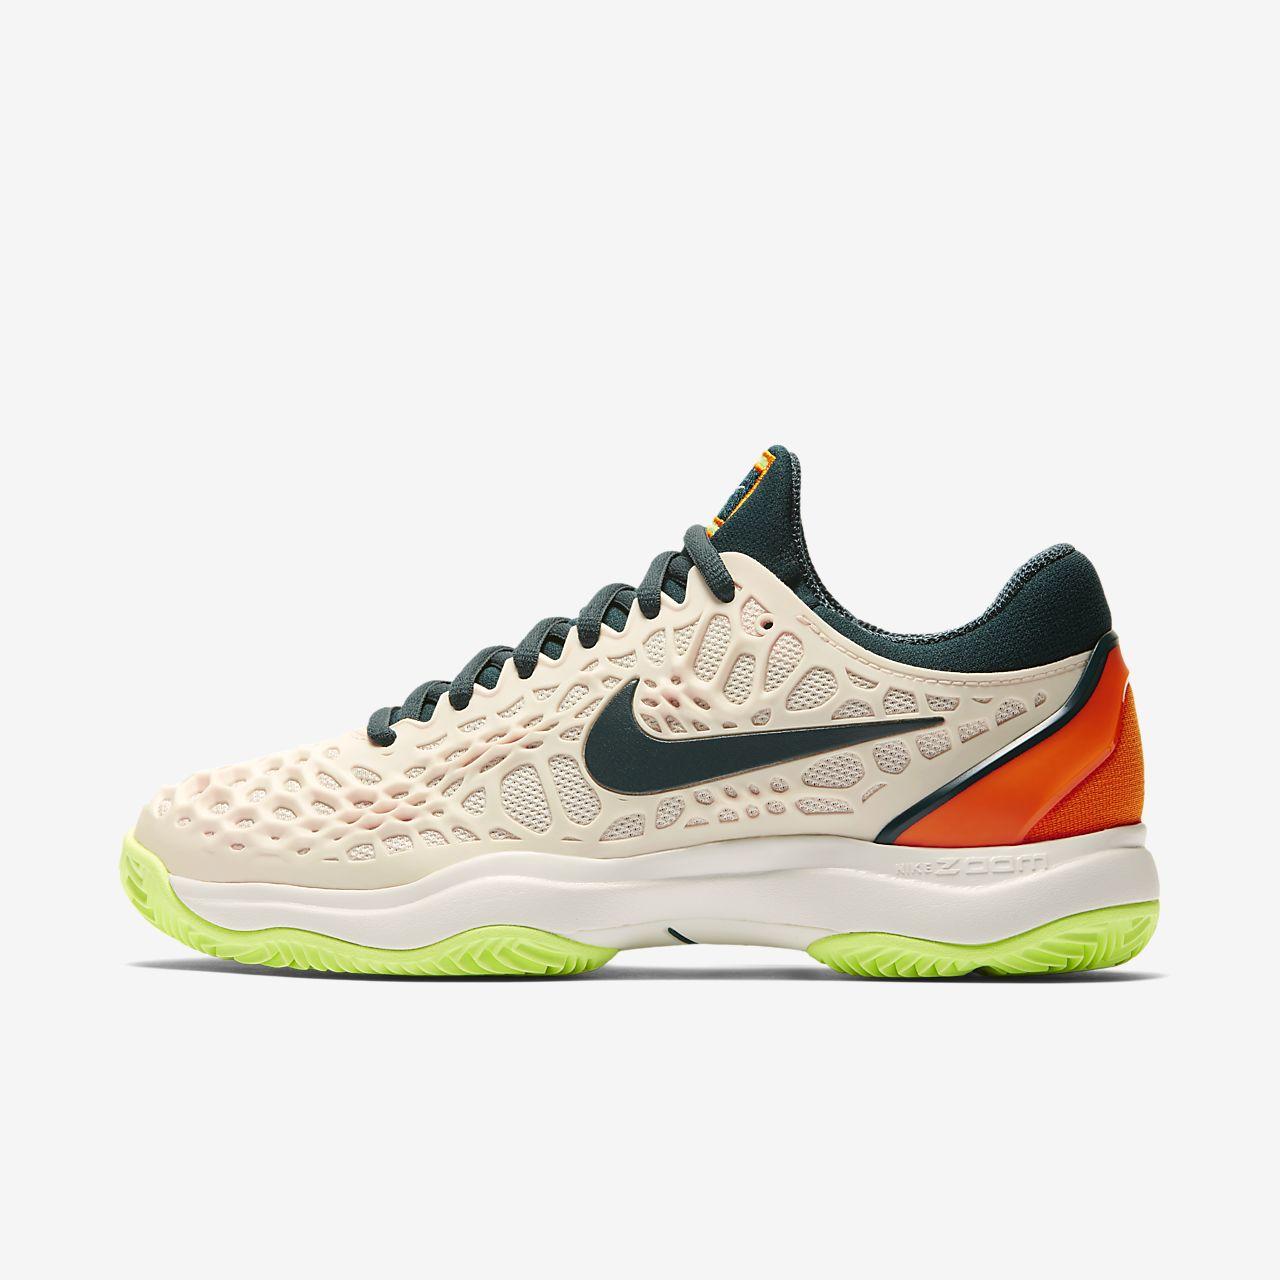 107423d3a6 Nike Zoom Cage 3 Clay Women s Tennis Shoe. Nike.com AU